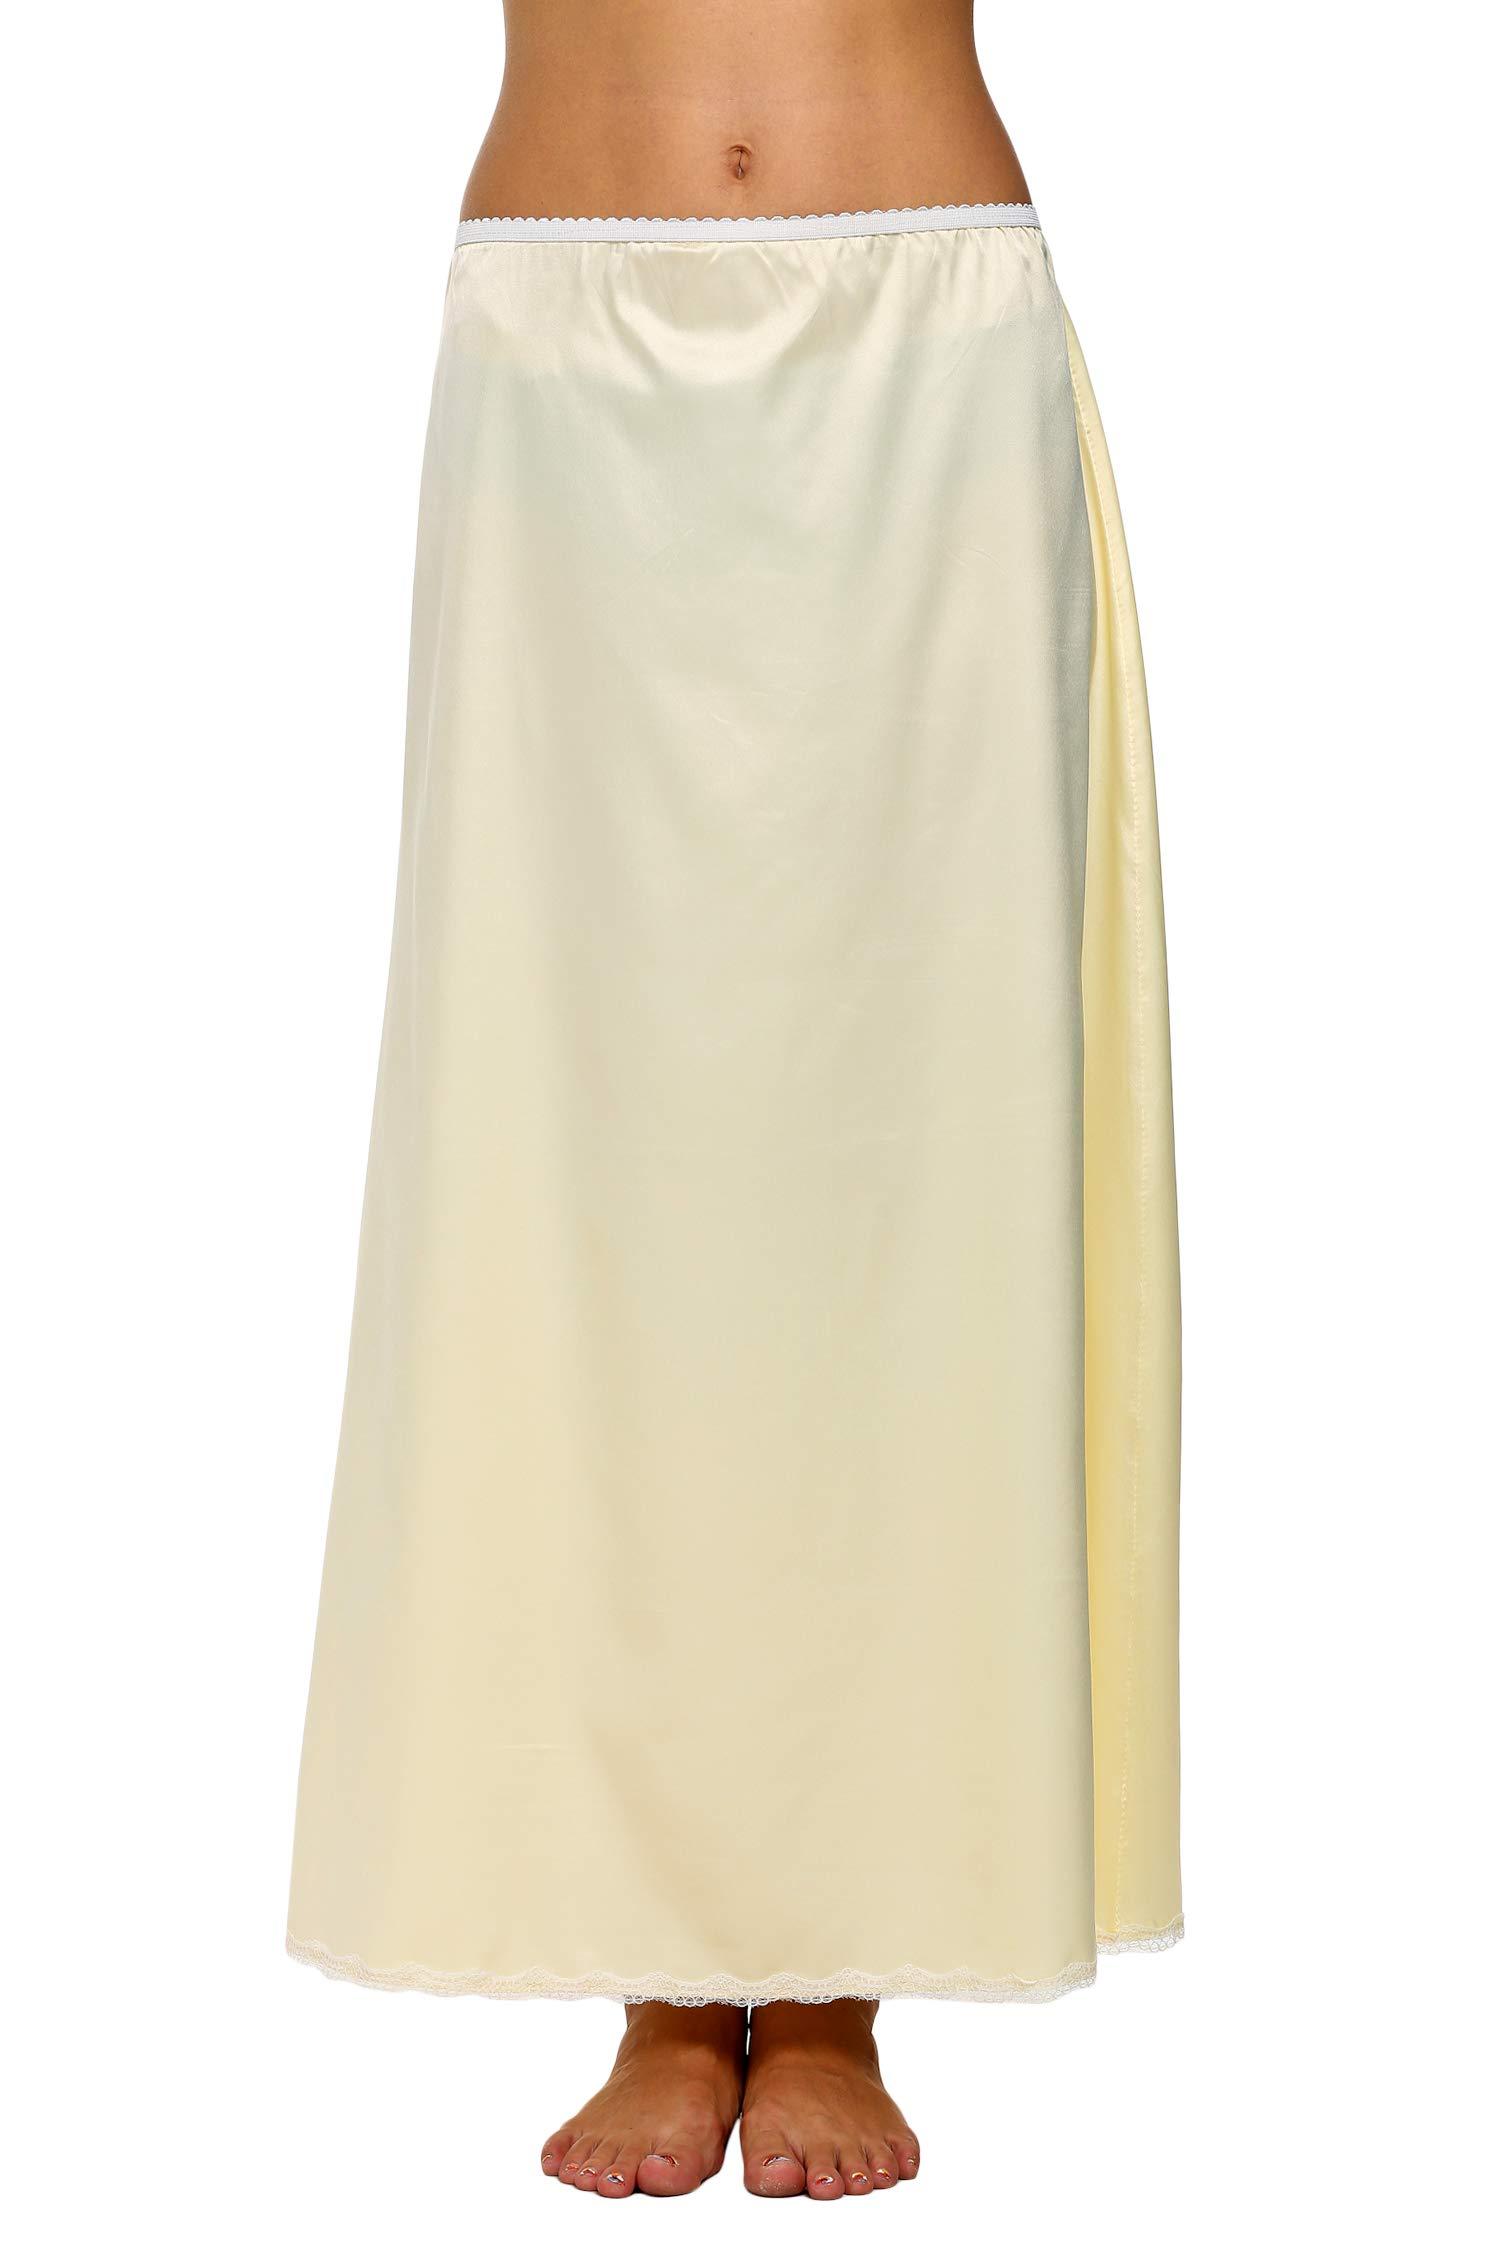 "Avidlove Women's Satin Half Slip 36"" Lace Long Underskirt S-XXL"